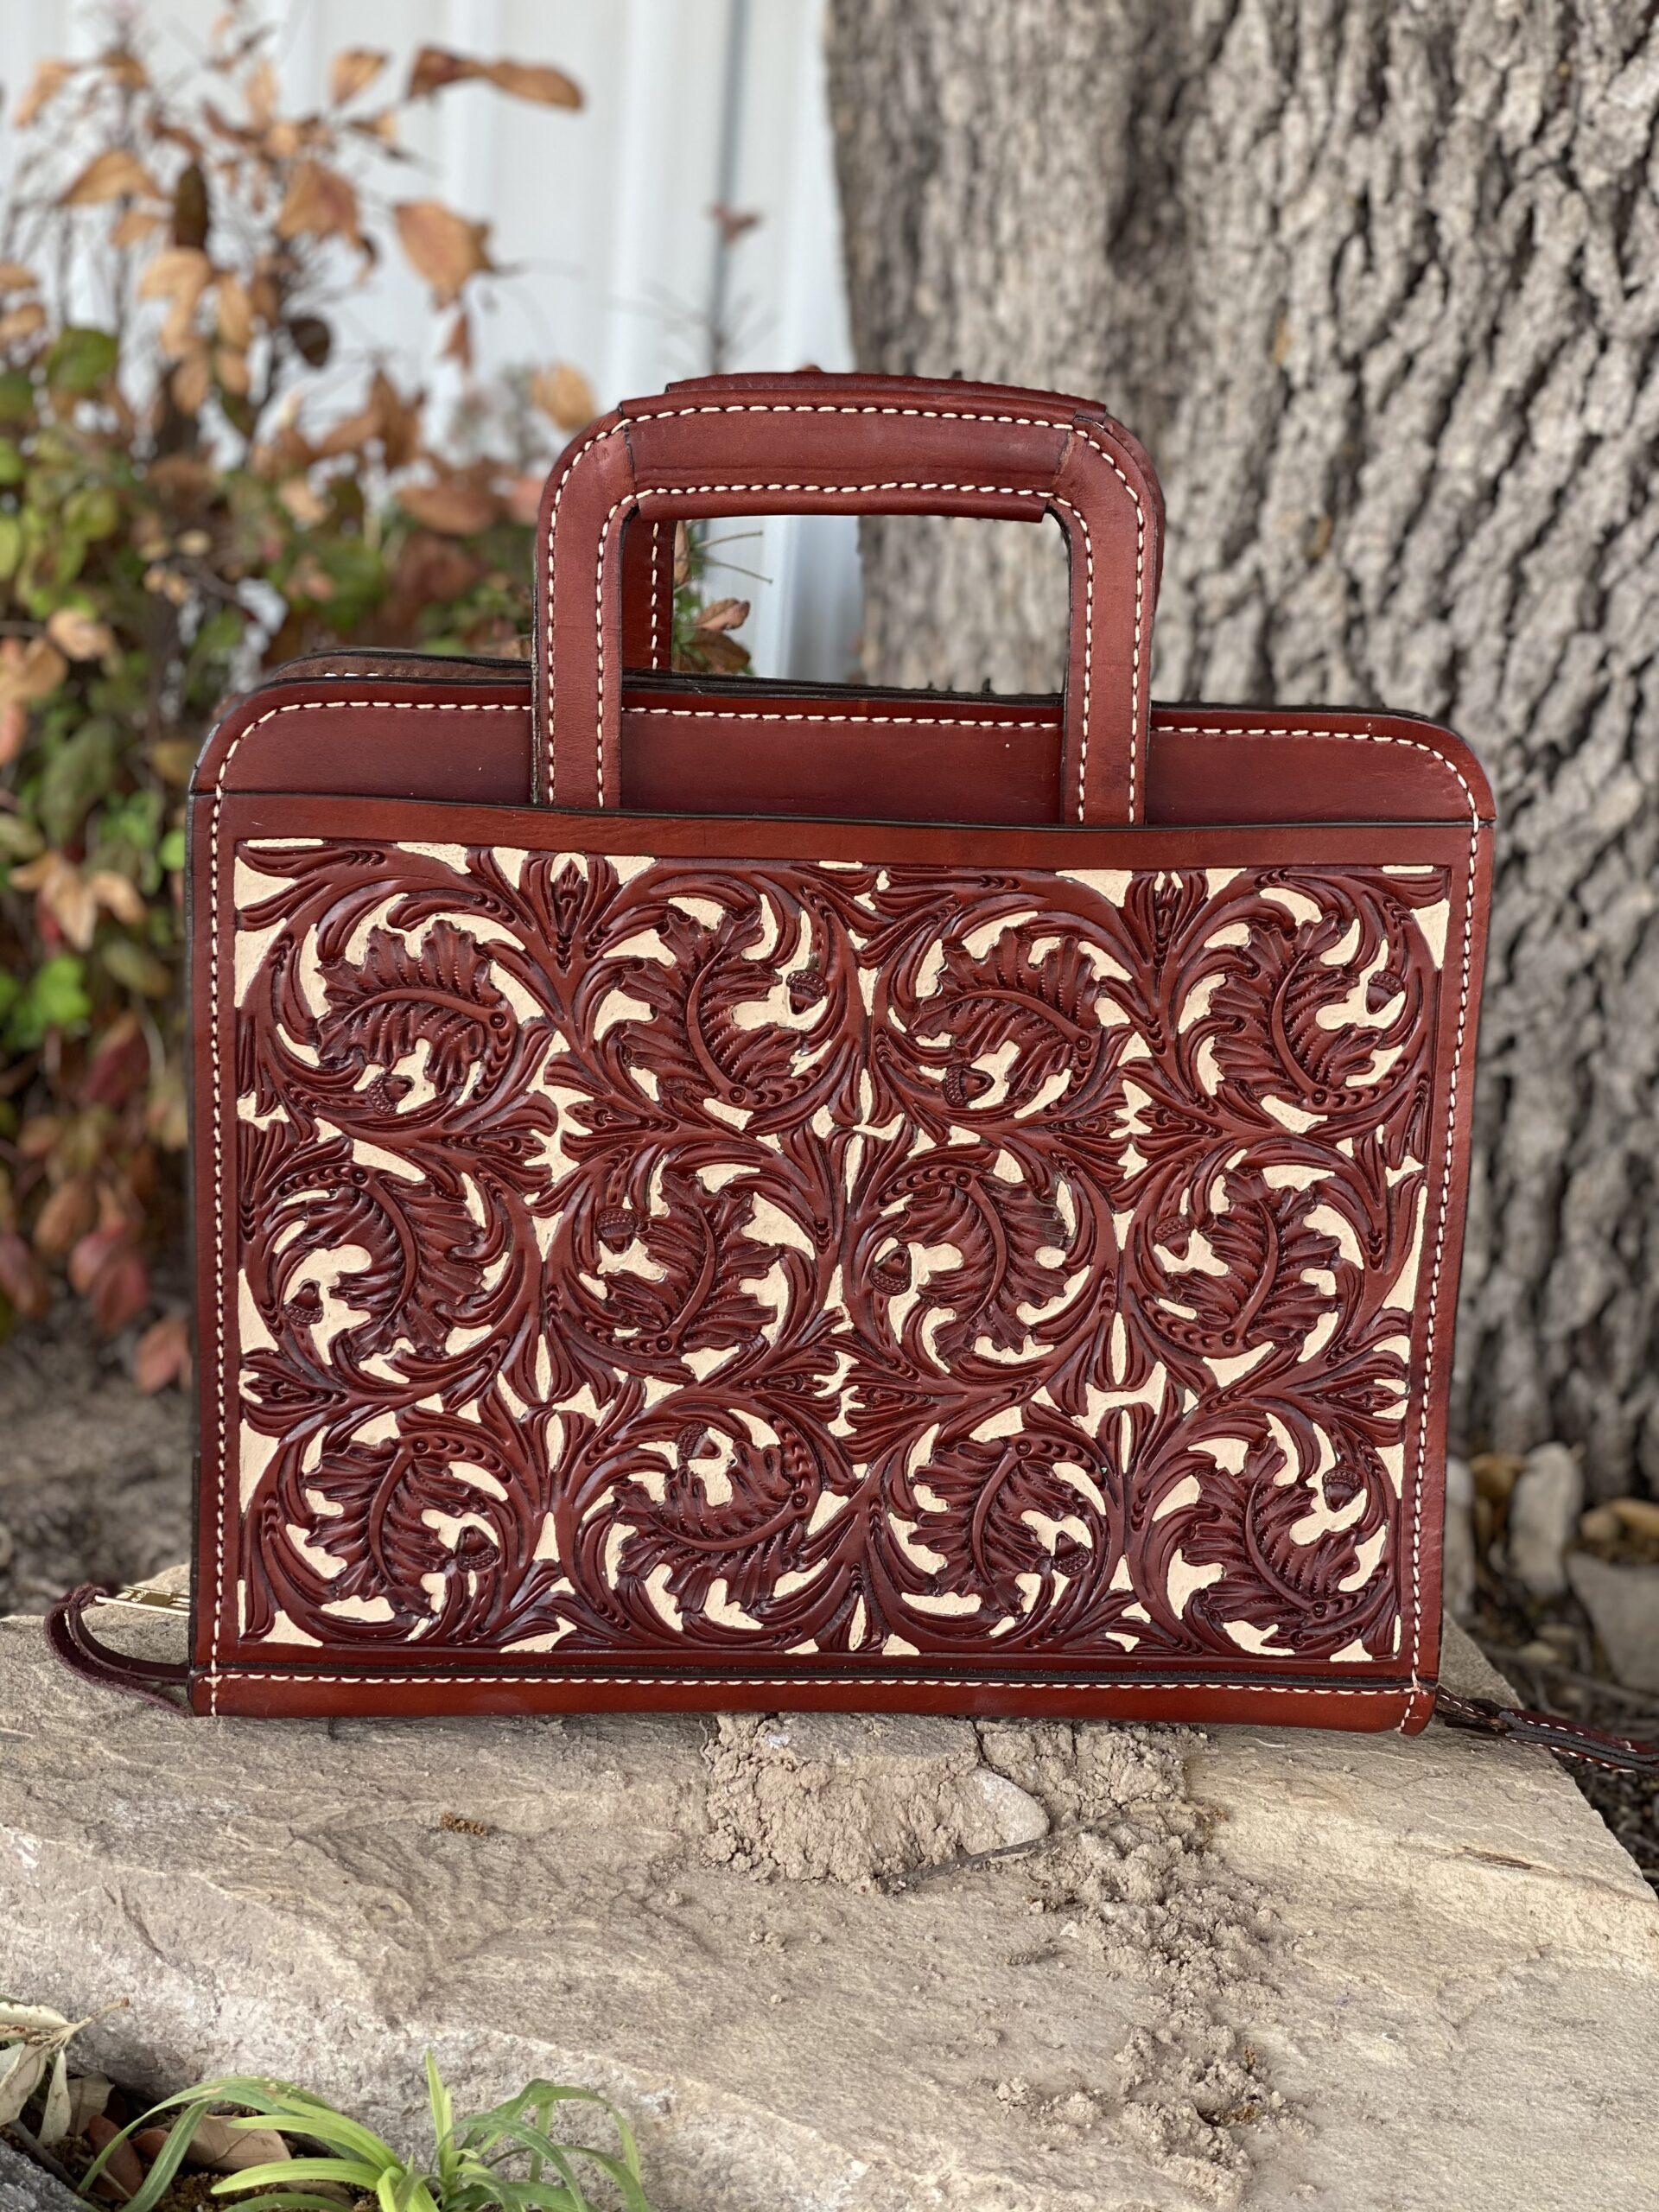 Toast oakleaf w/ tan background cowboy briefcase